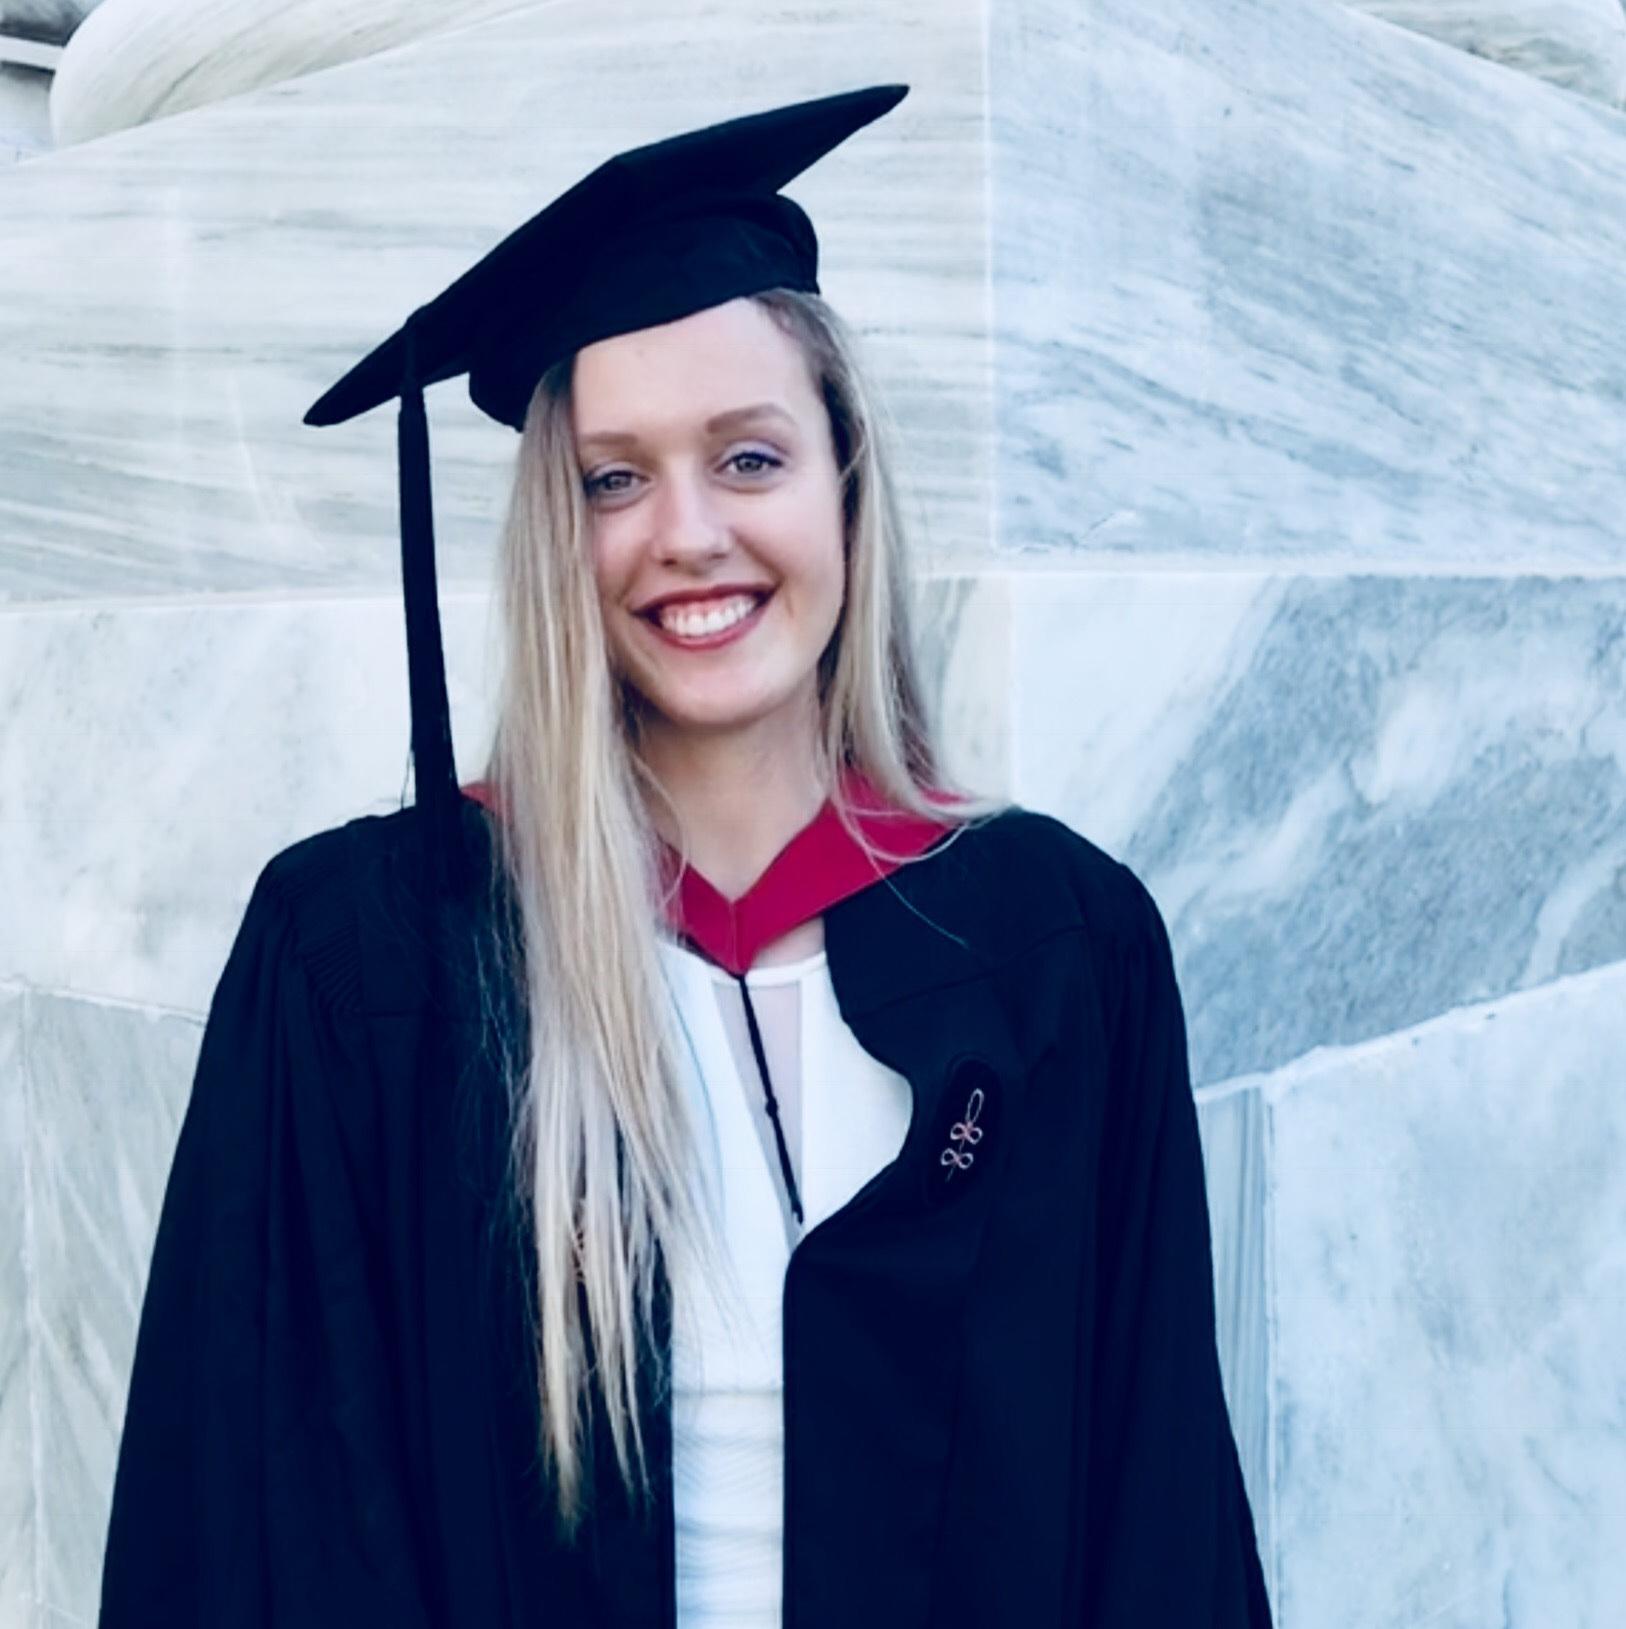 Harvard Graduation, mai 2018. Foto: Elling Eidbo.